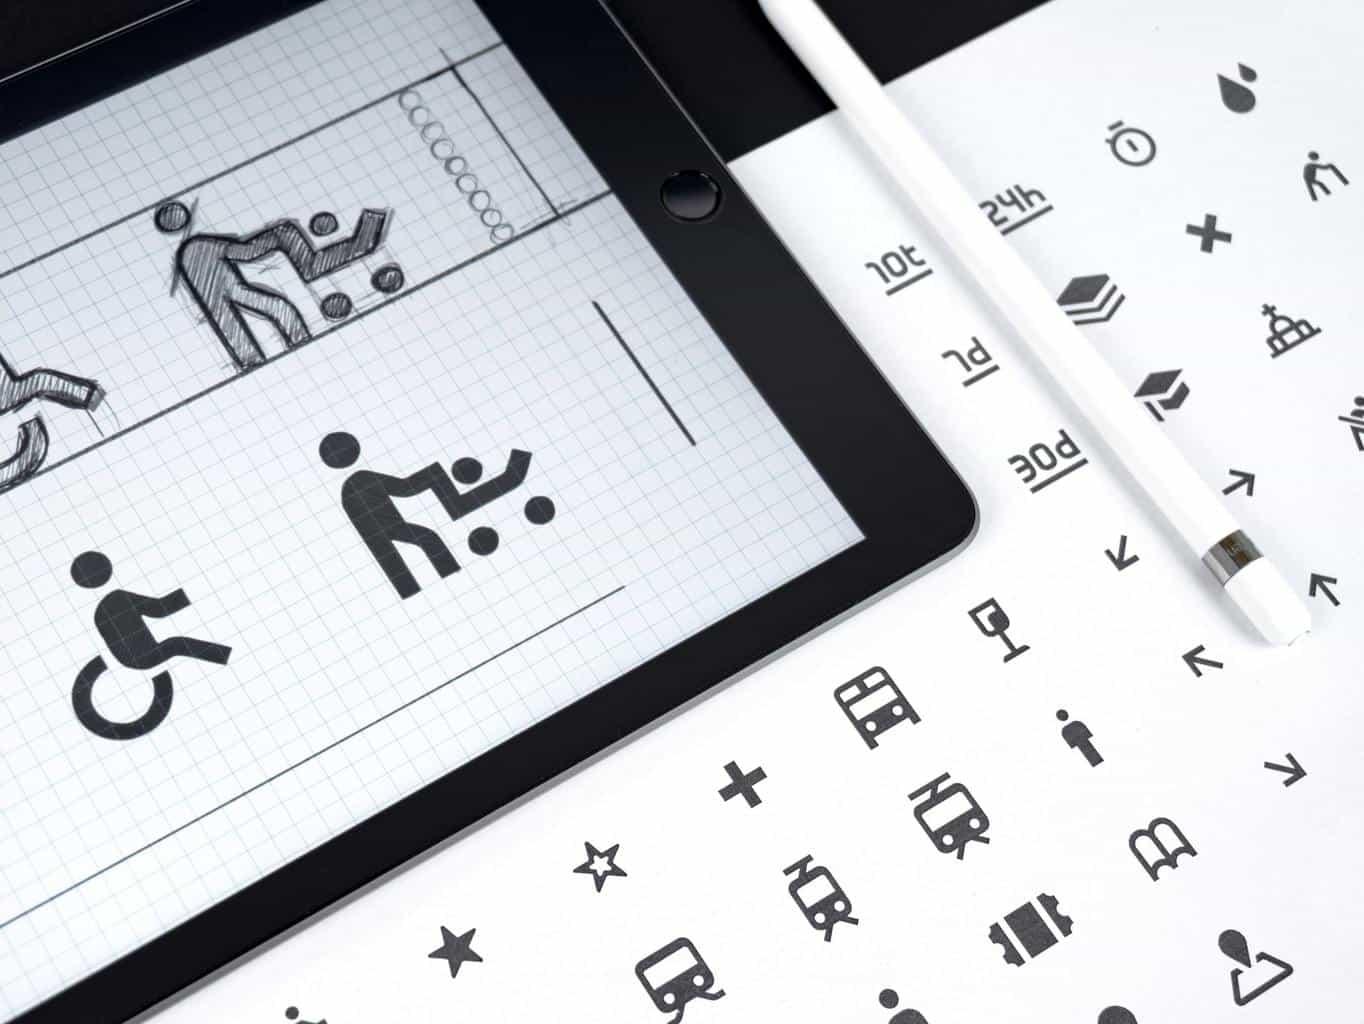 Icons on iPad